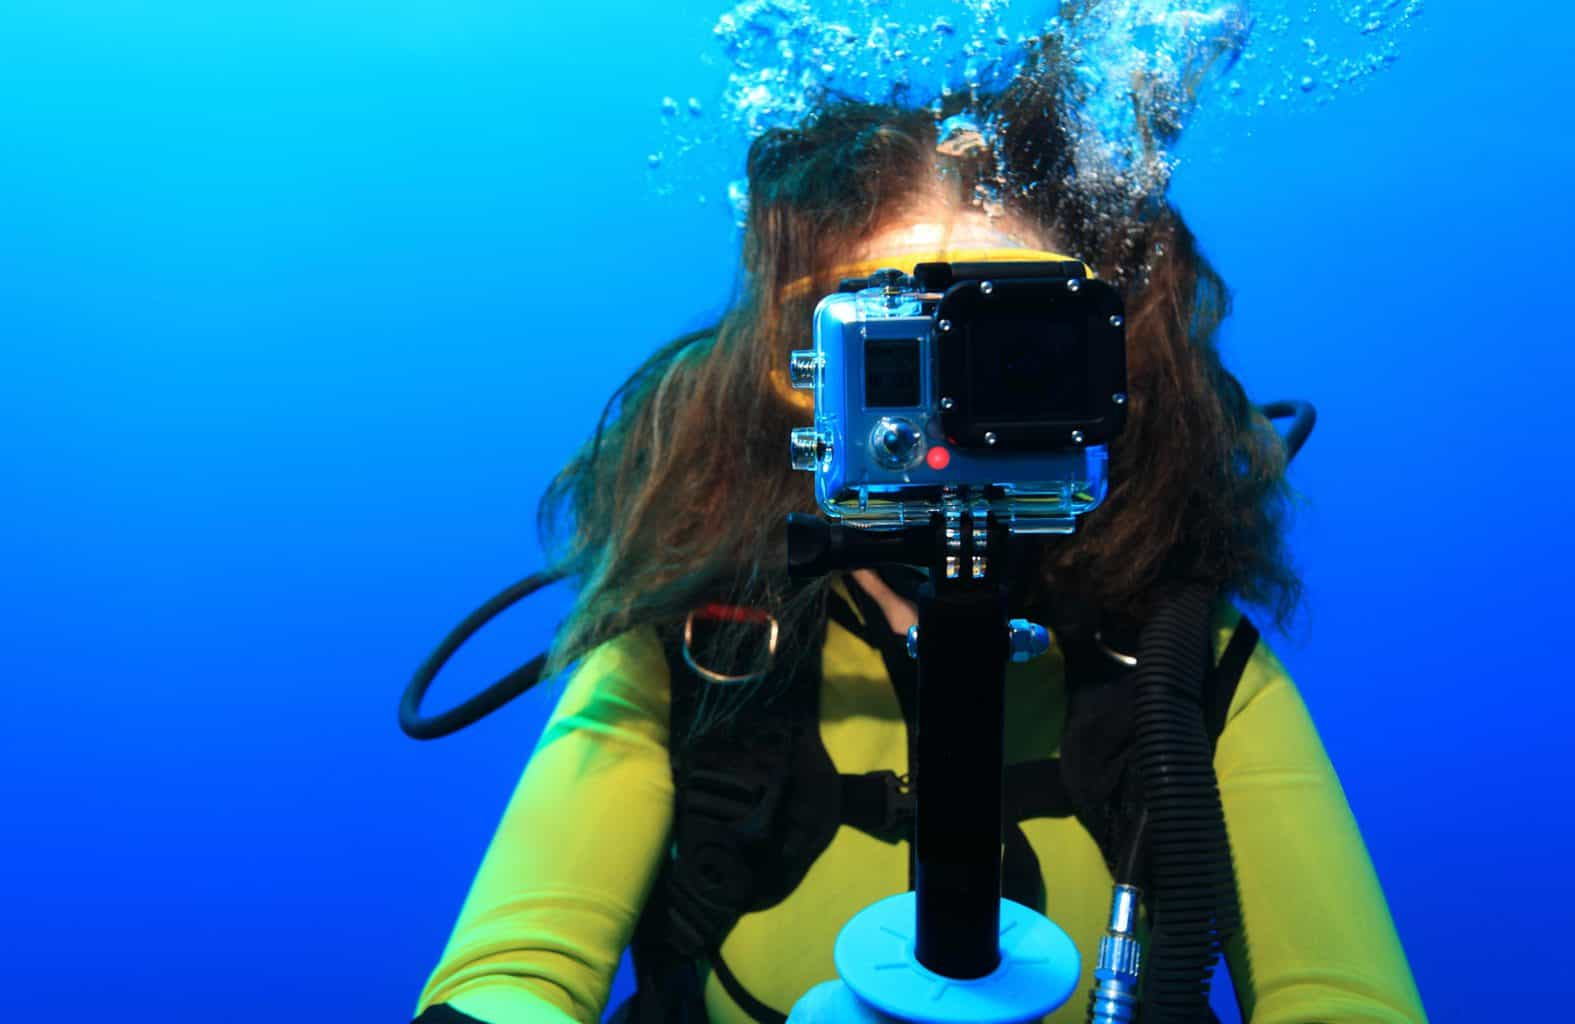 List of the Best Cheap Waterproof Cameras